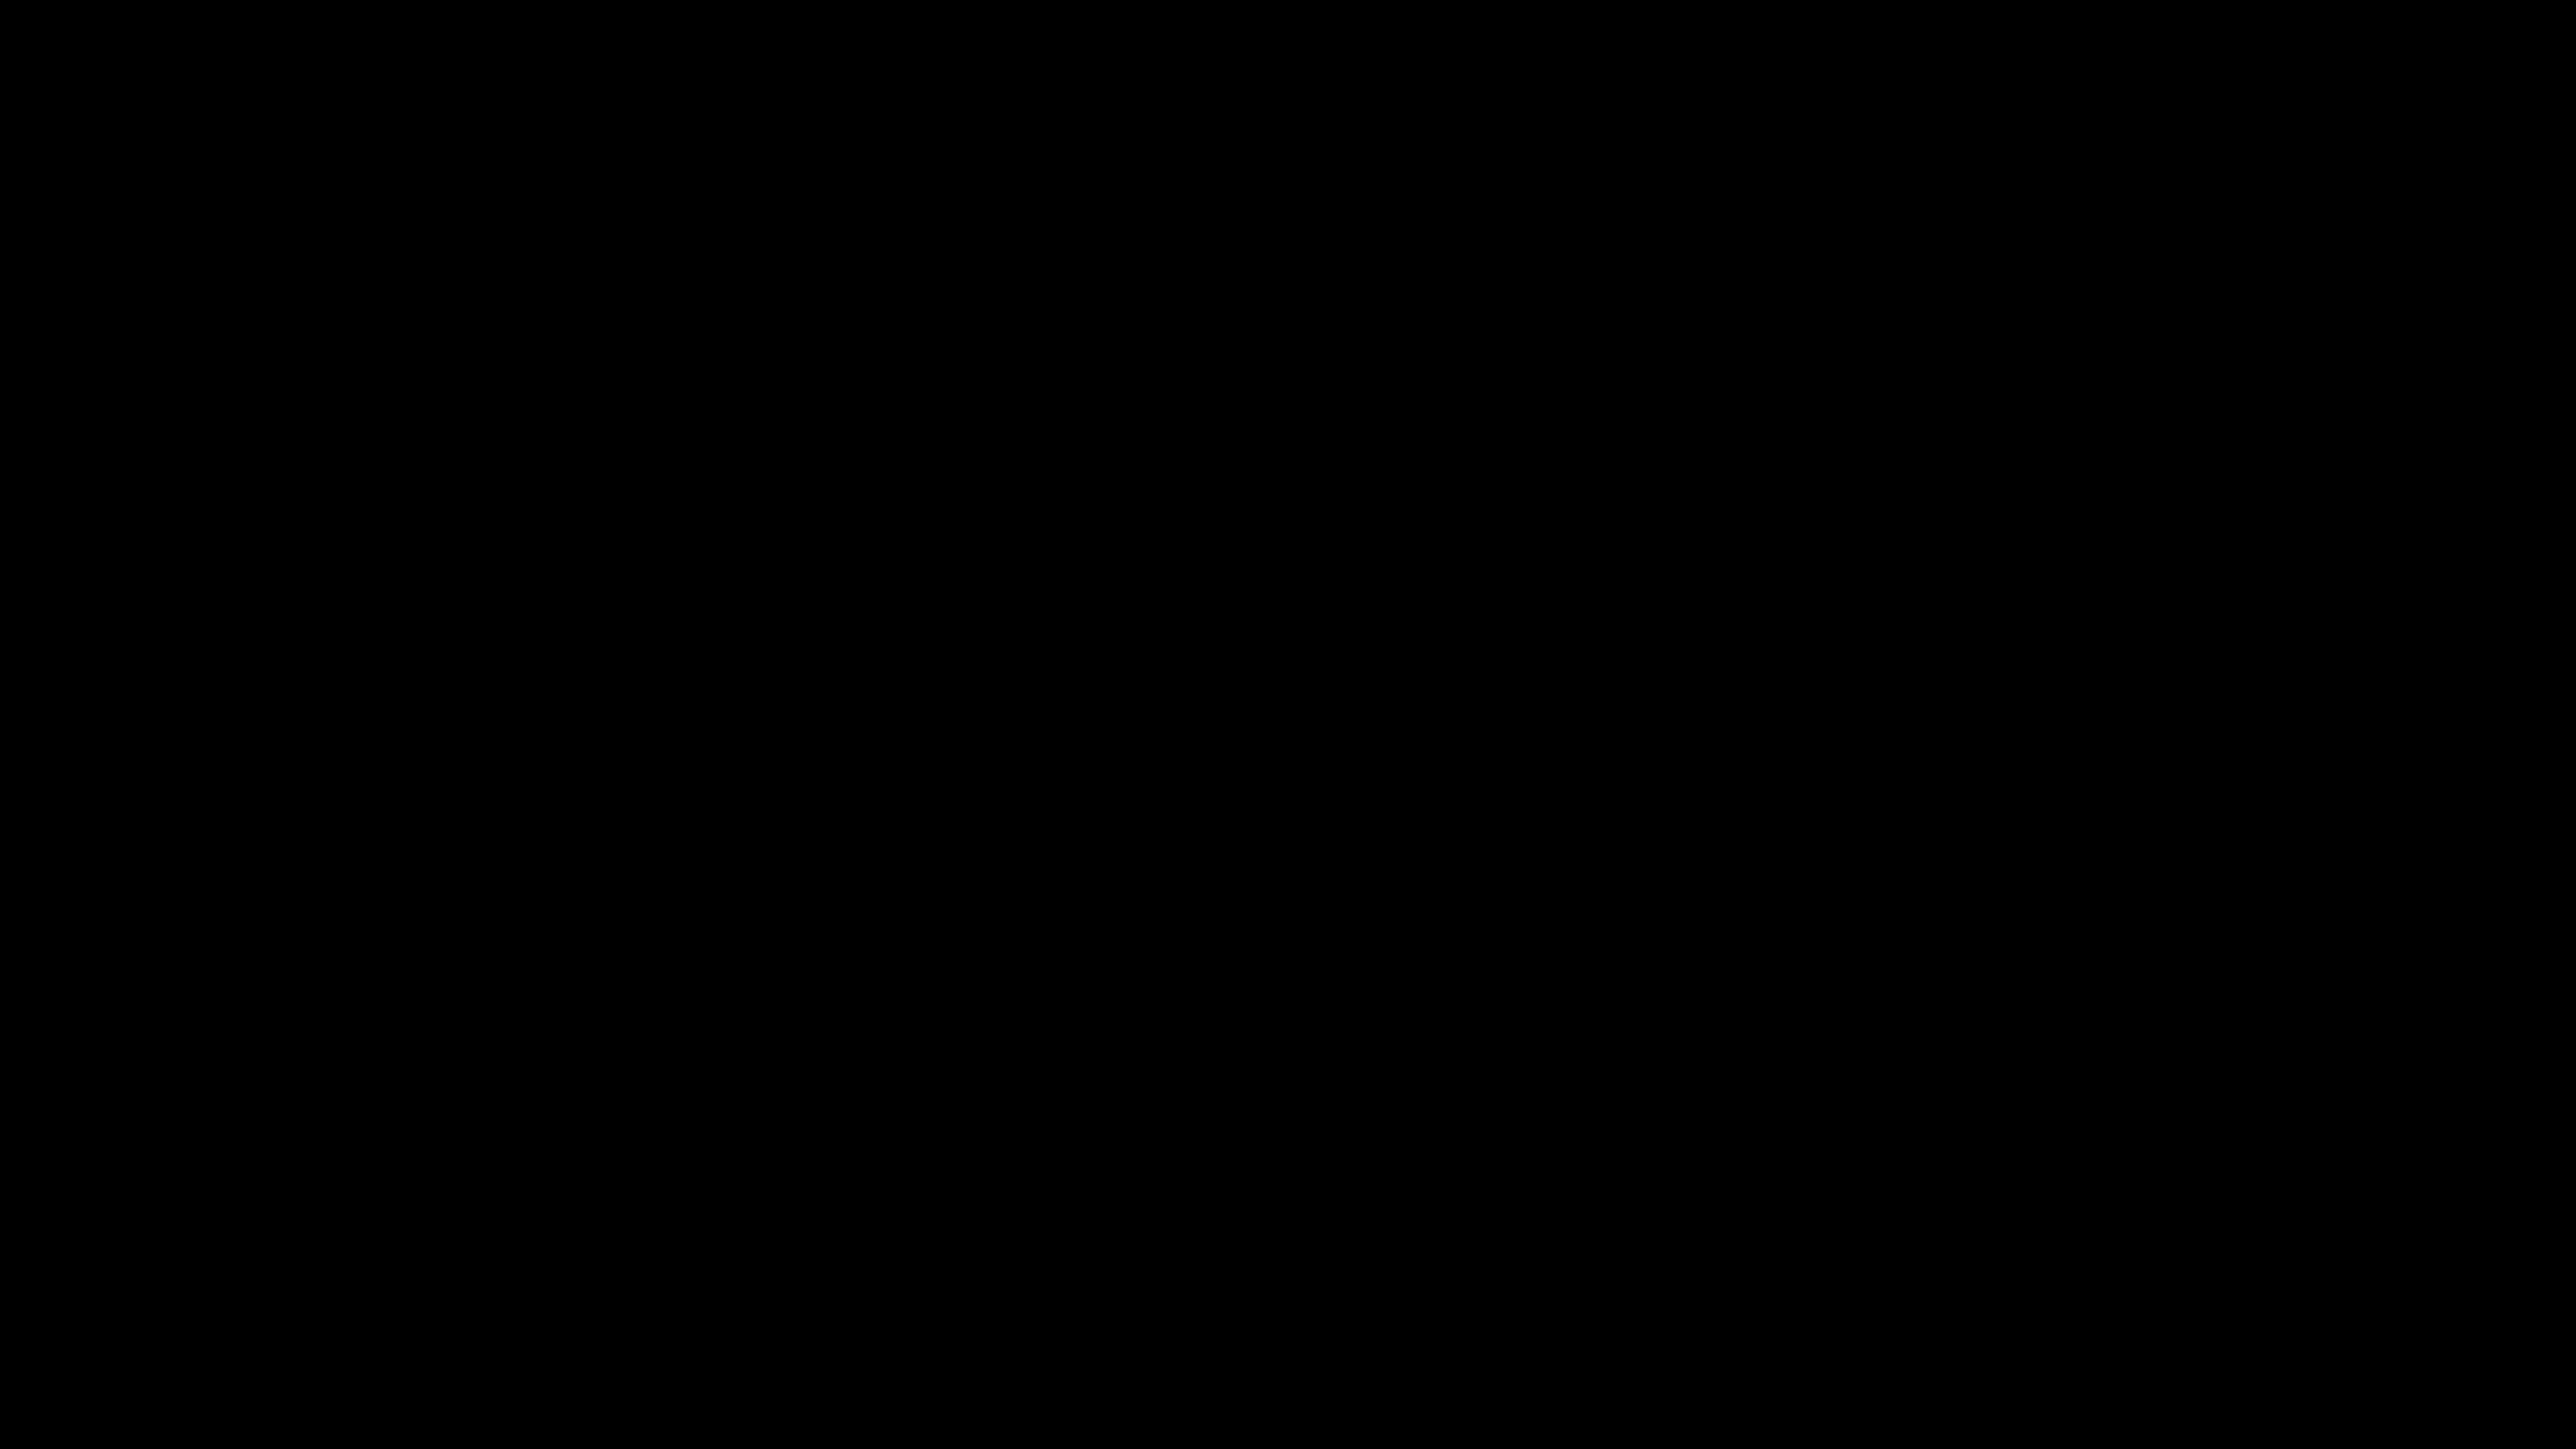 Contest-Line1 GIFs